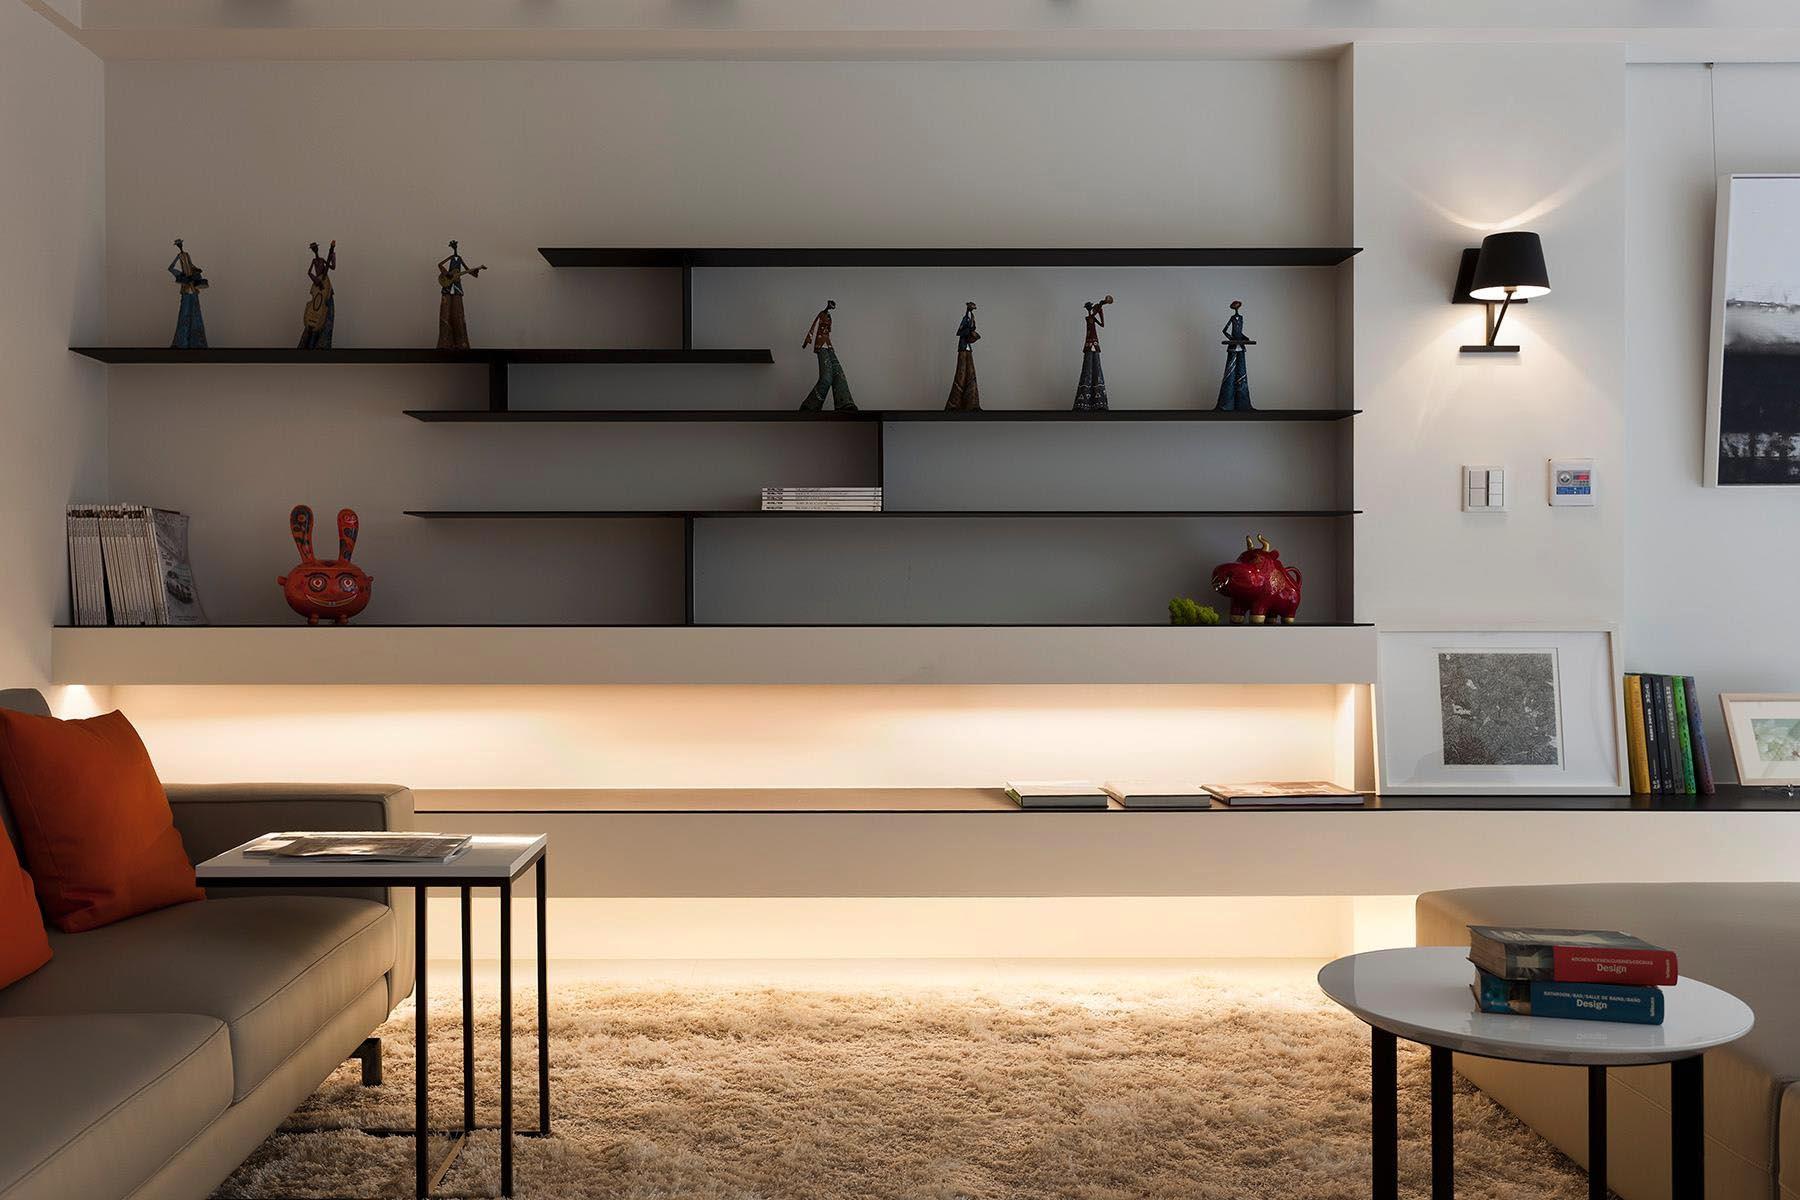 vanity wall shelf ideas for living room of beautiful decor decor shelves bookshelf and decorating 87